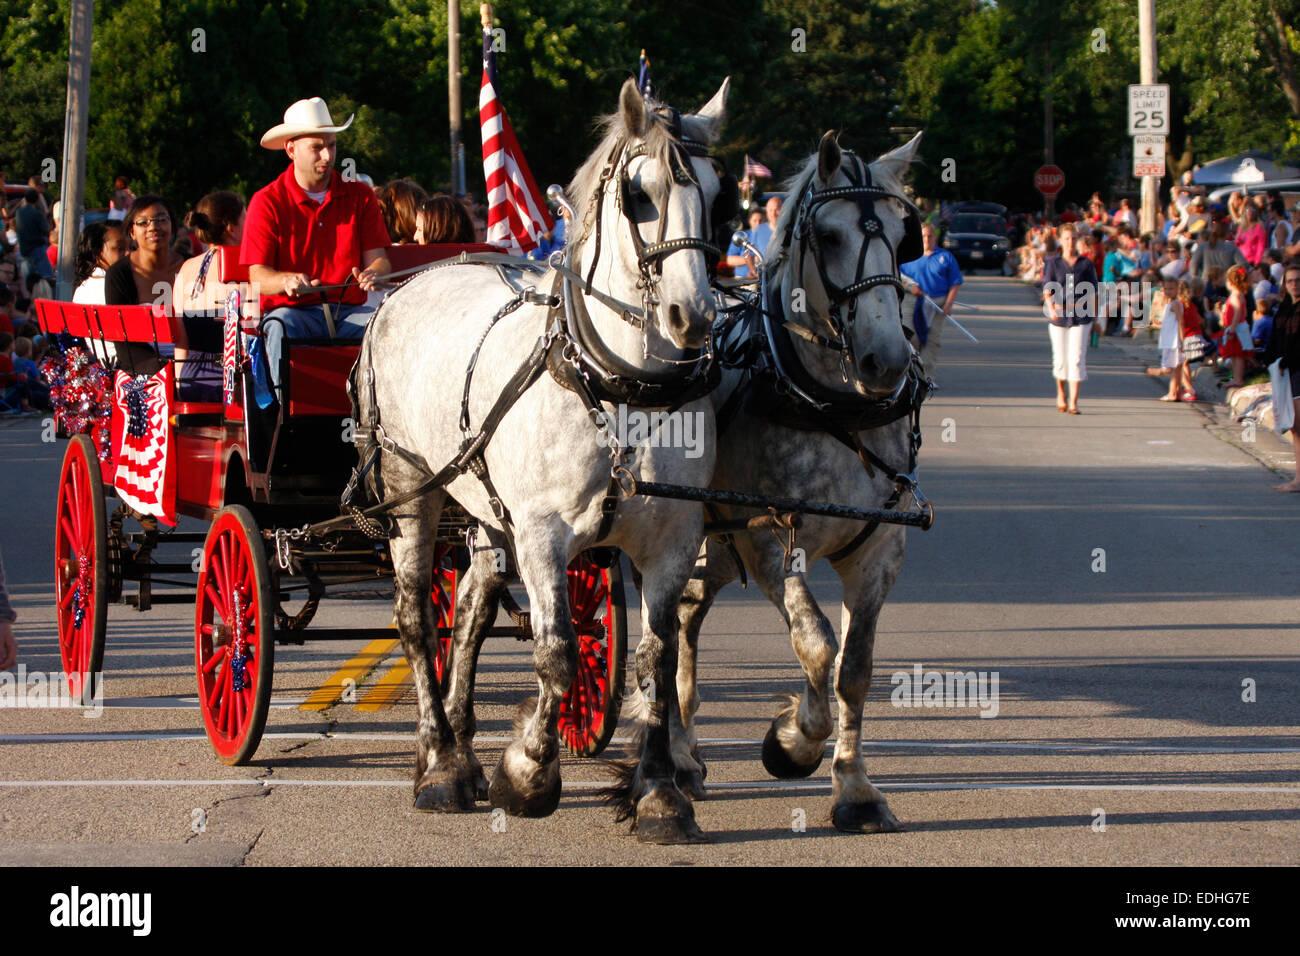 Horses Pulling Wagon Stock Photos Amp Horses Pulling Wagon